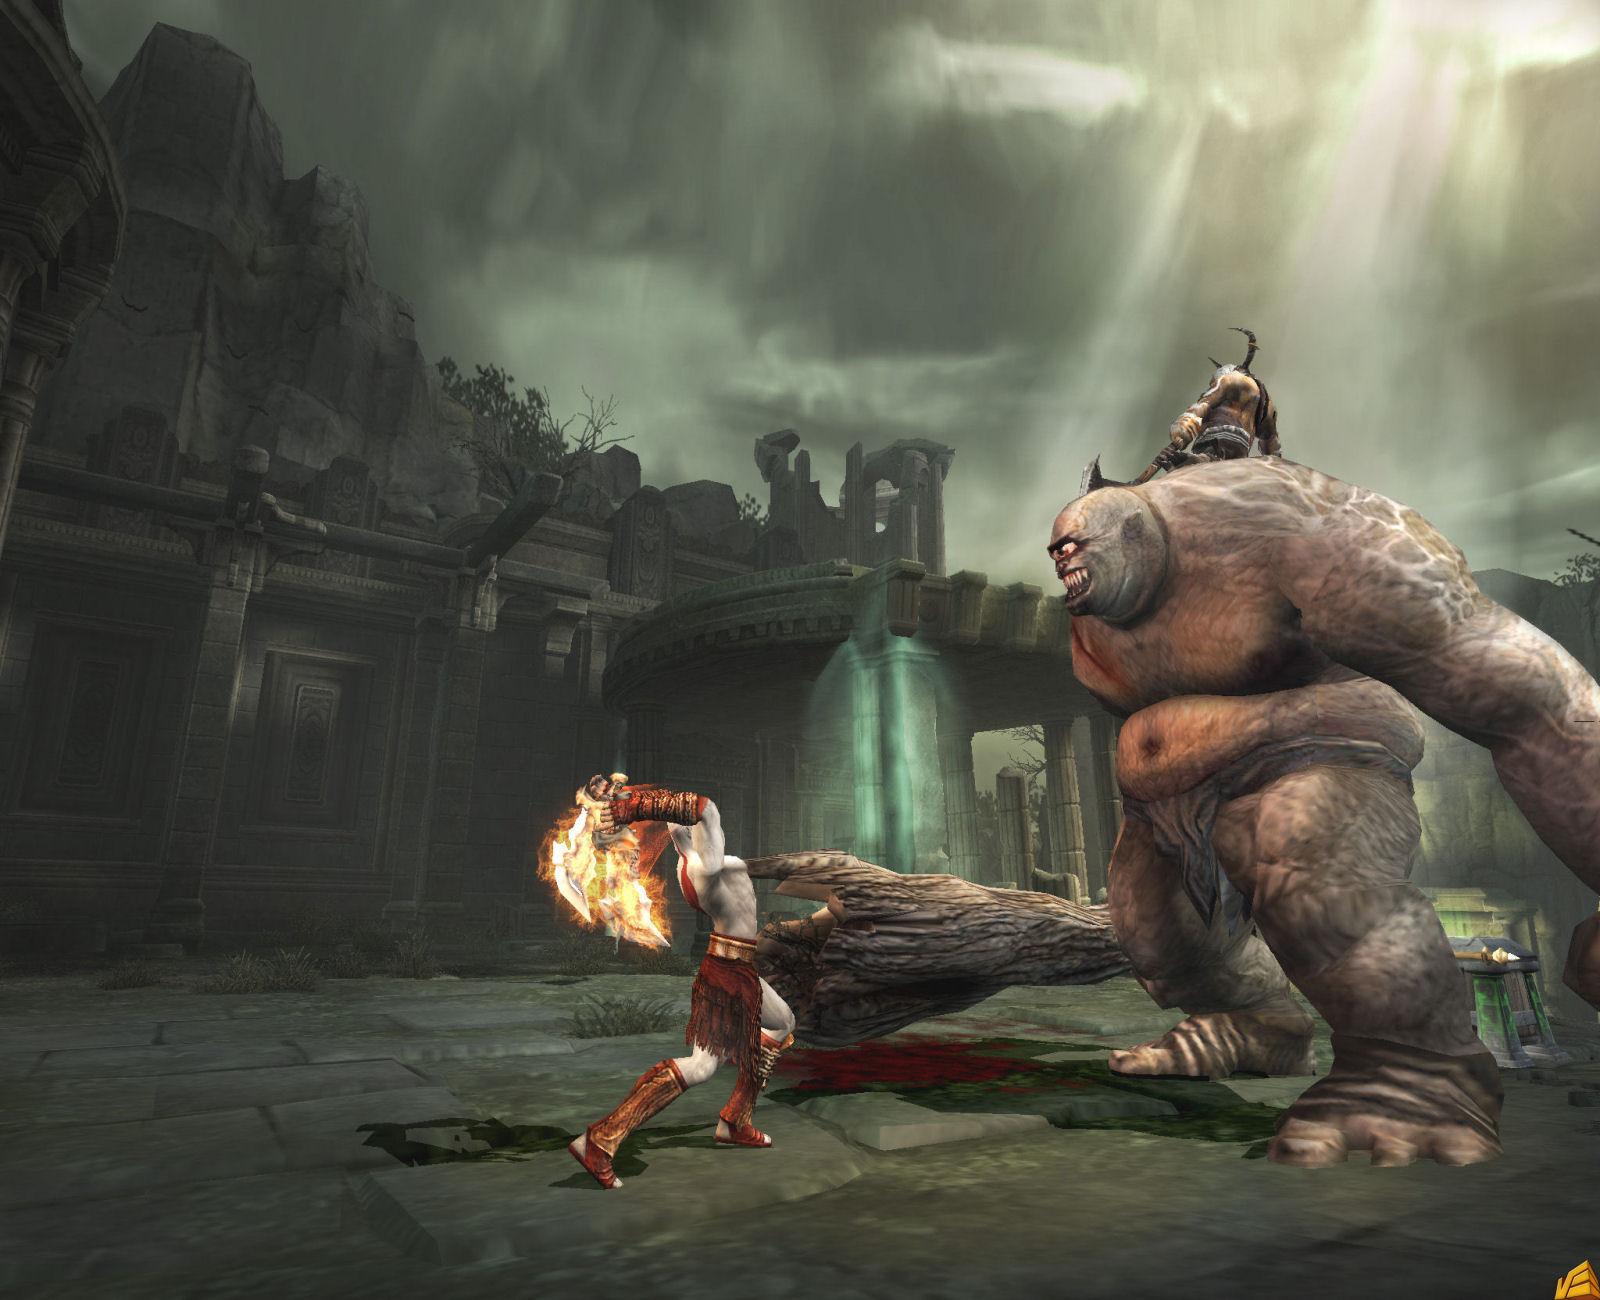 Free pc games download: god of war 2 pc game free download.